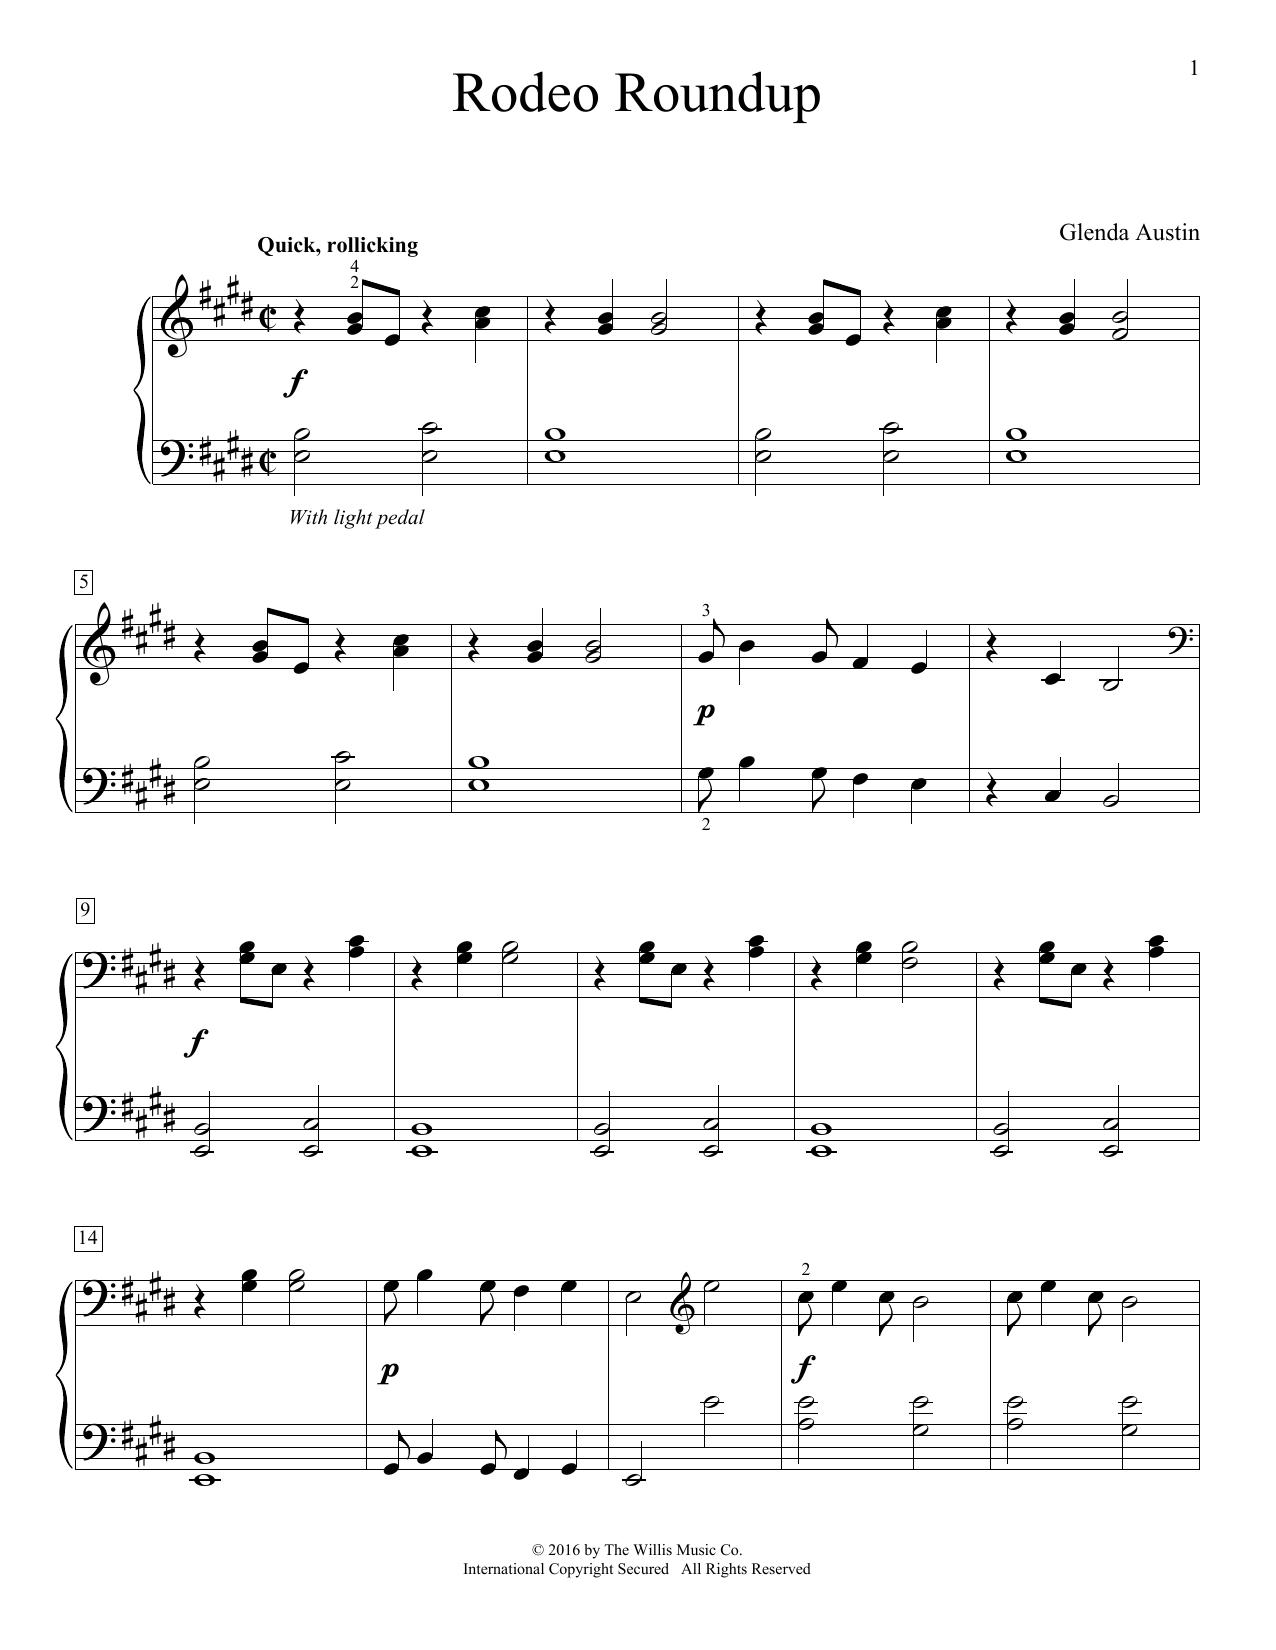 Glenda Austin Rodeo Roundup sheet music notes and chords. Download Printable PDF.